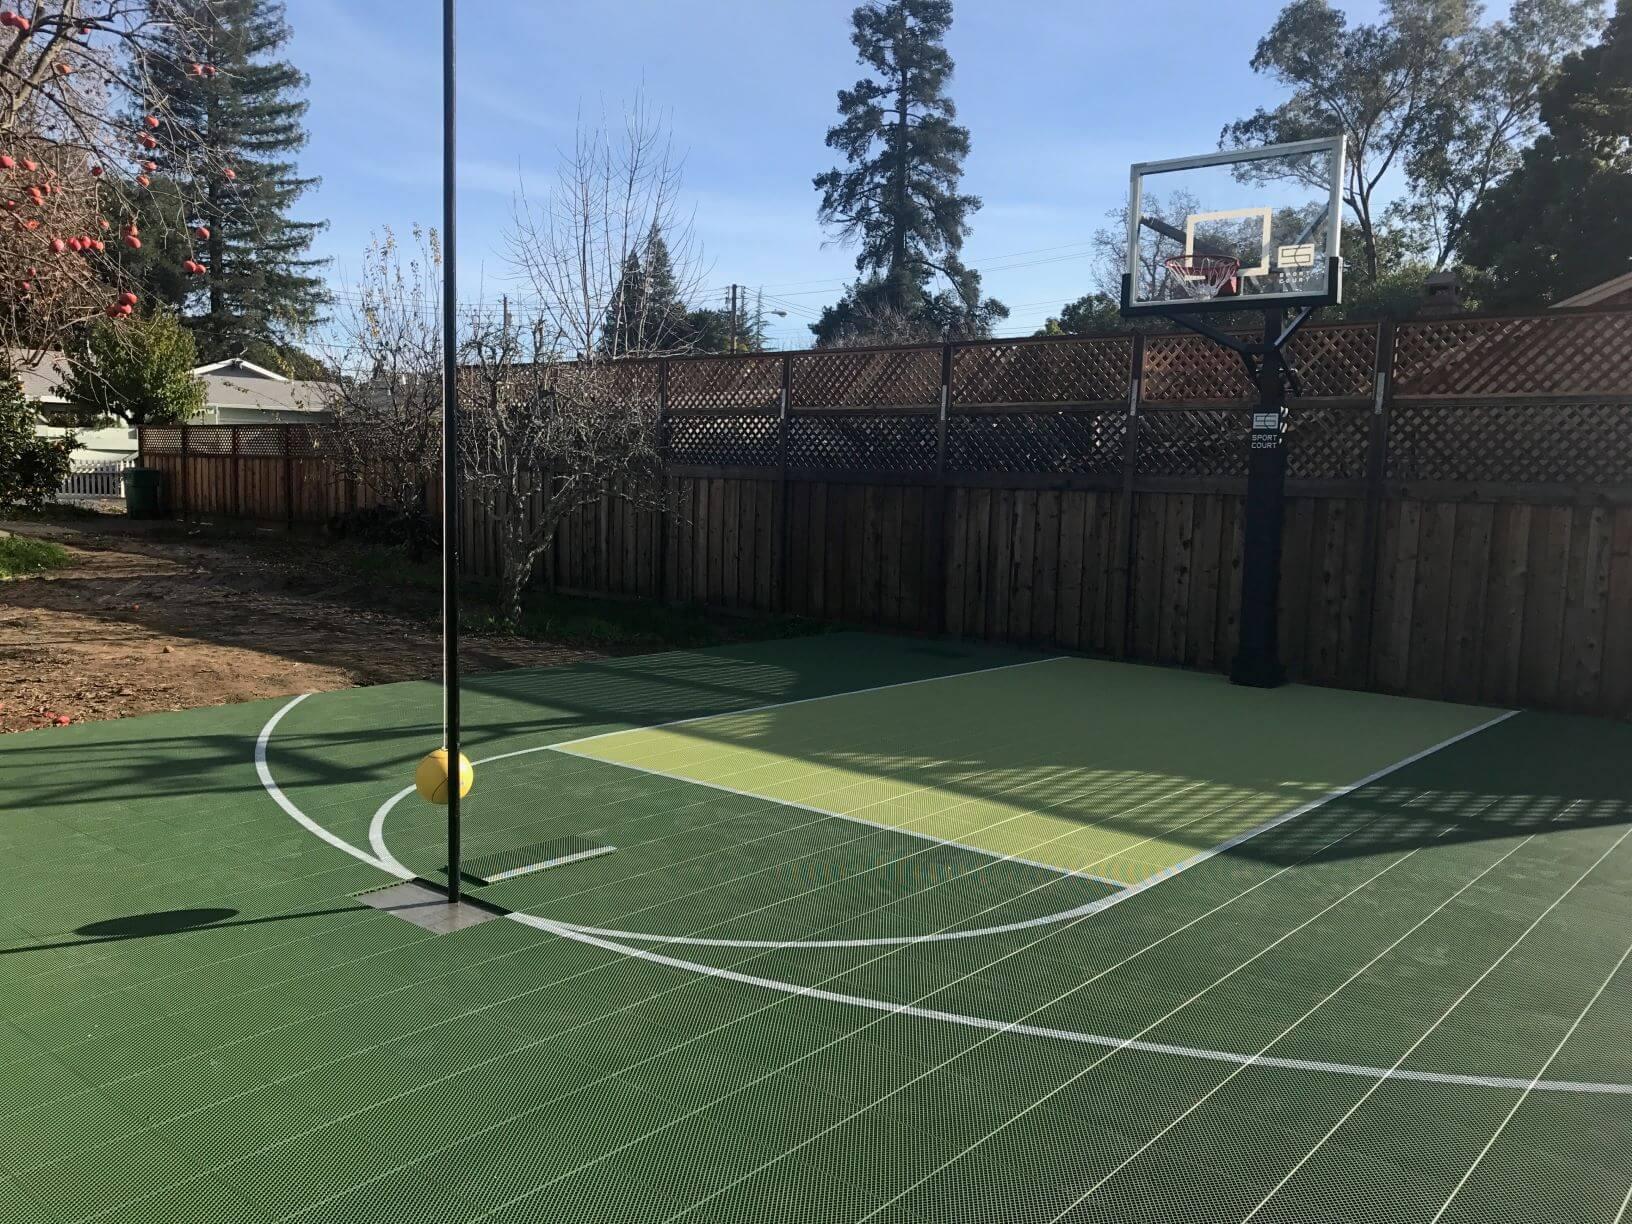 Backyard Sport Court Multi Game Outdoor Residential Allsport America